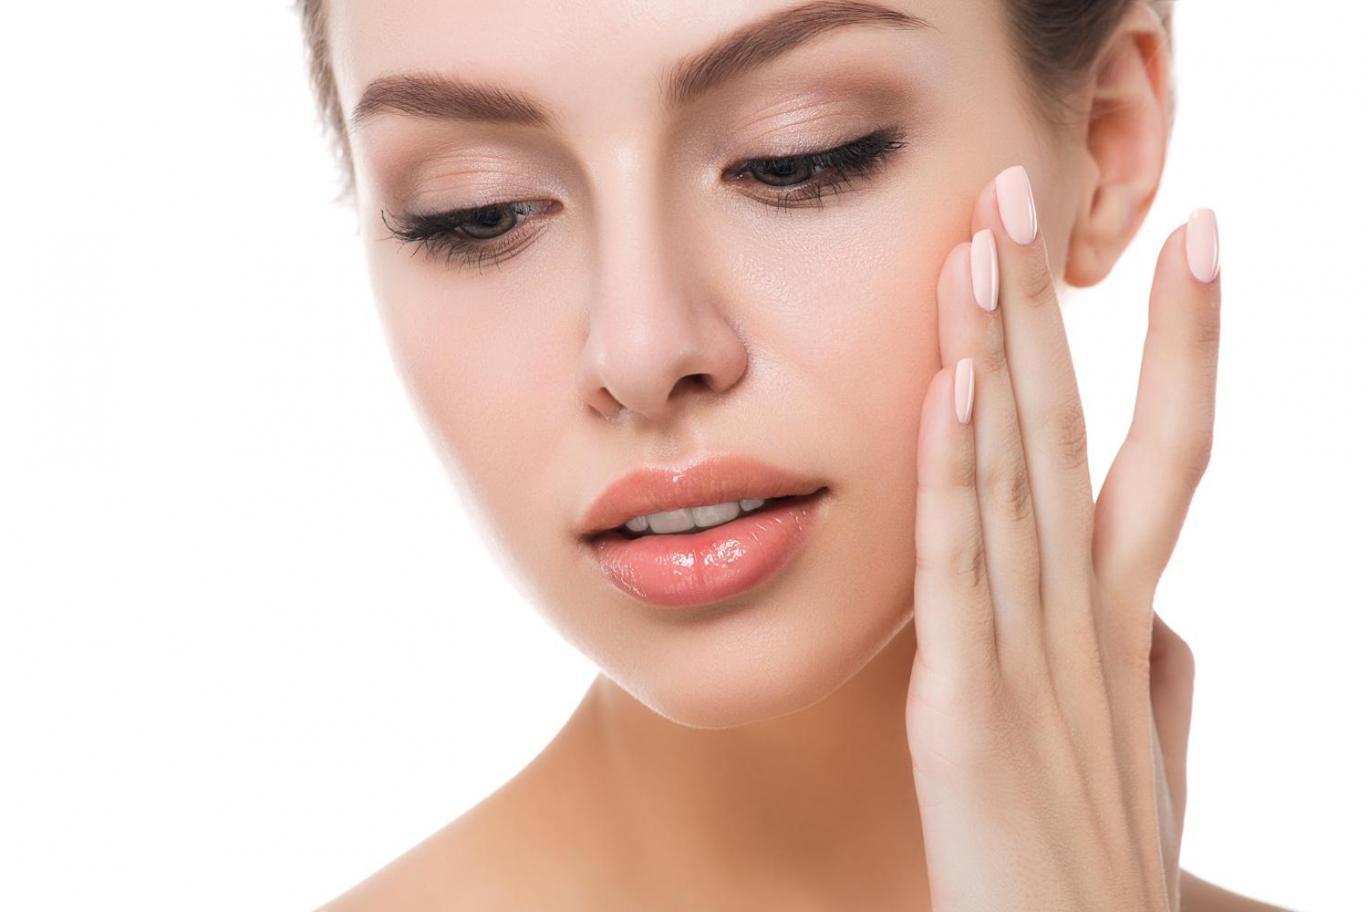 Best Natural Face Packs For Oily Skin